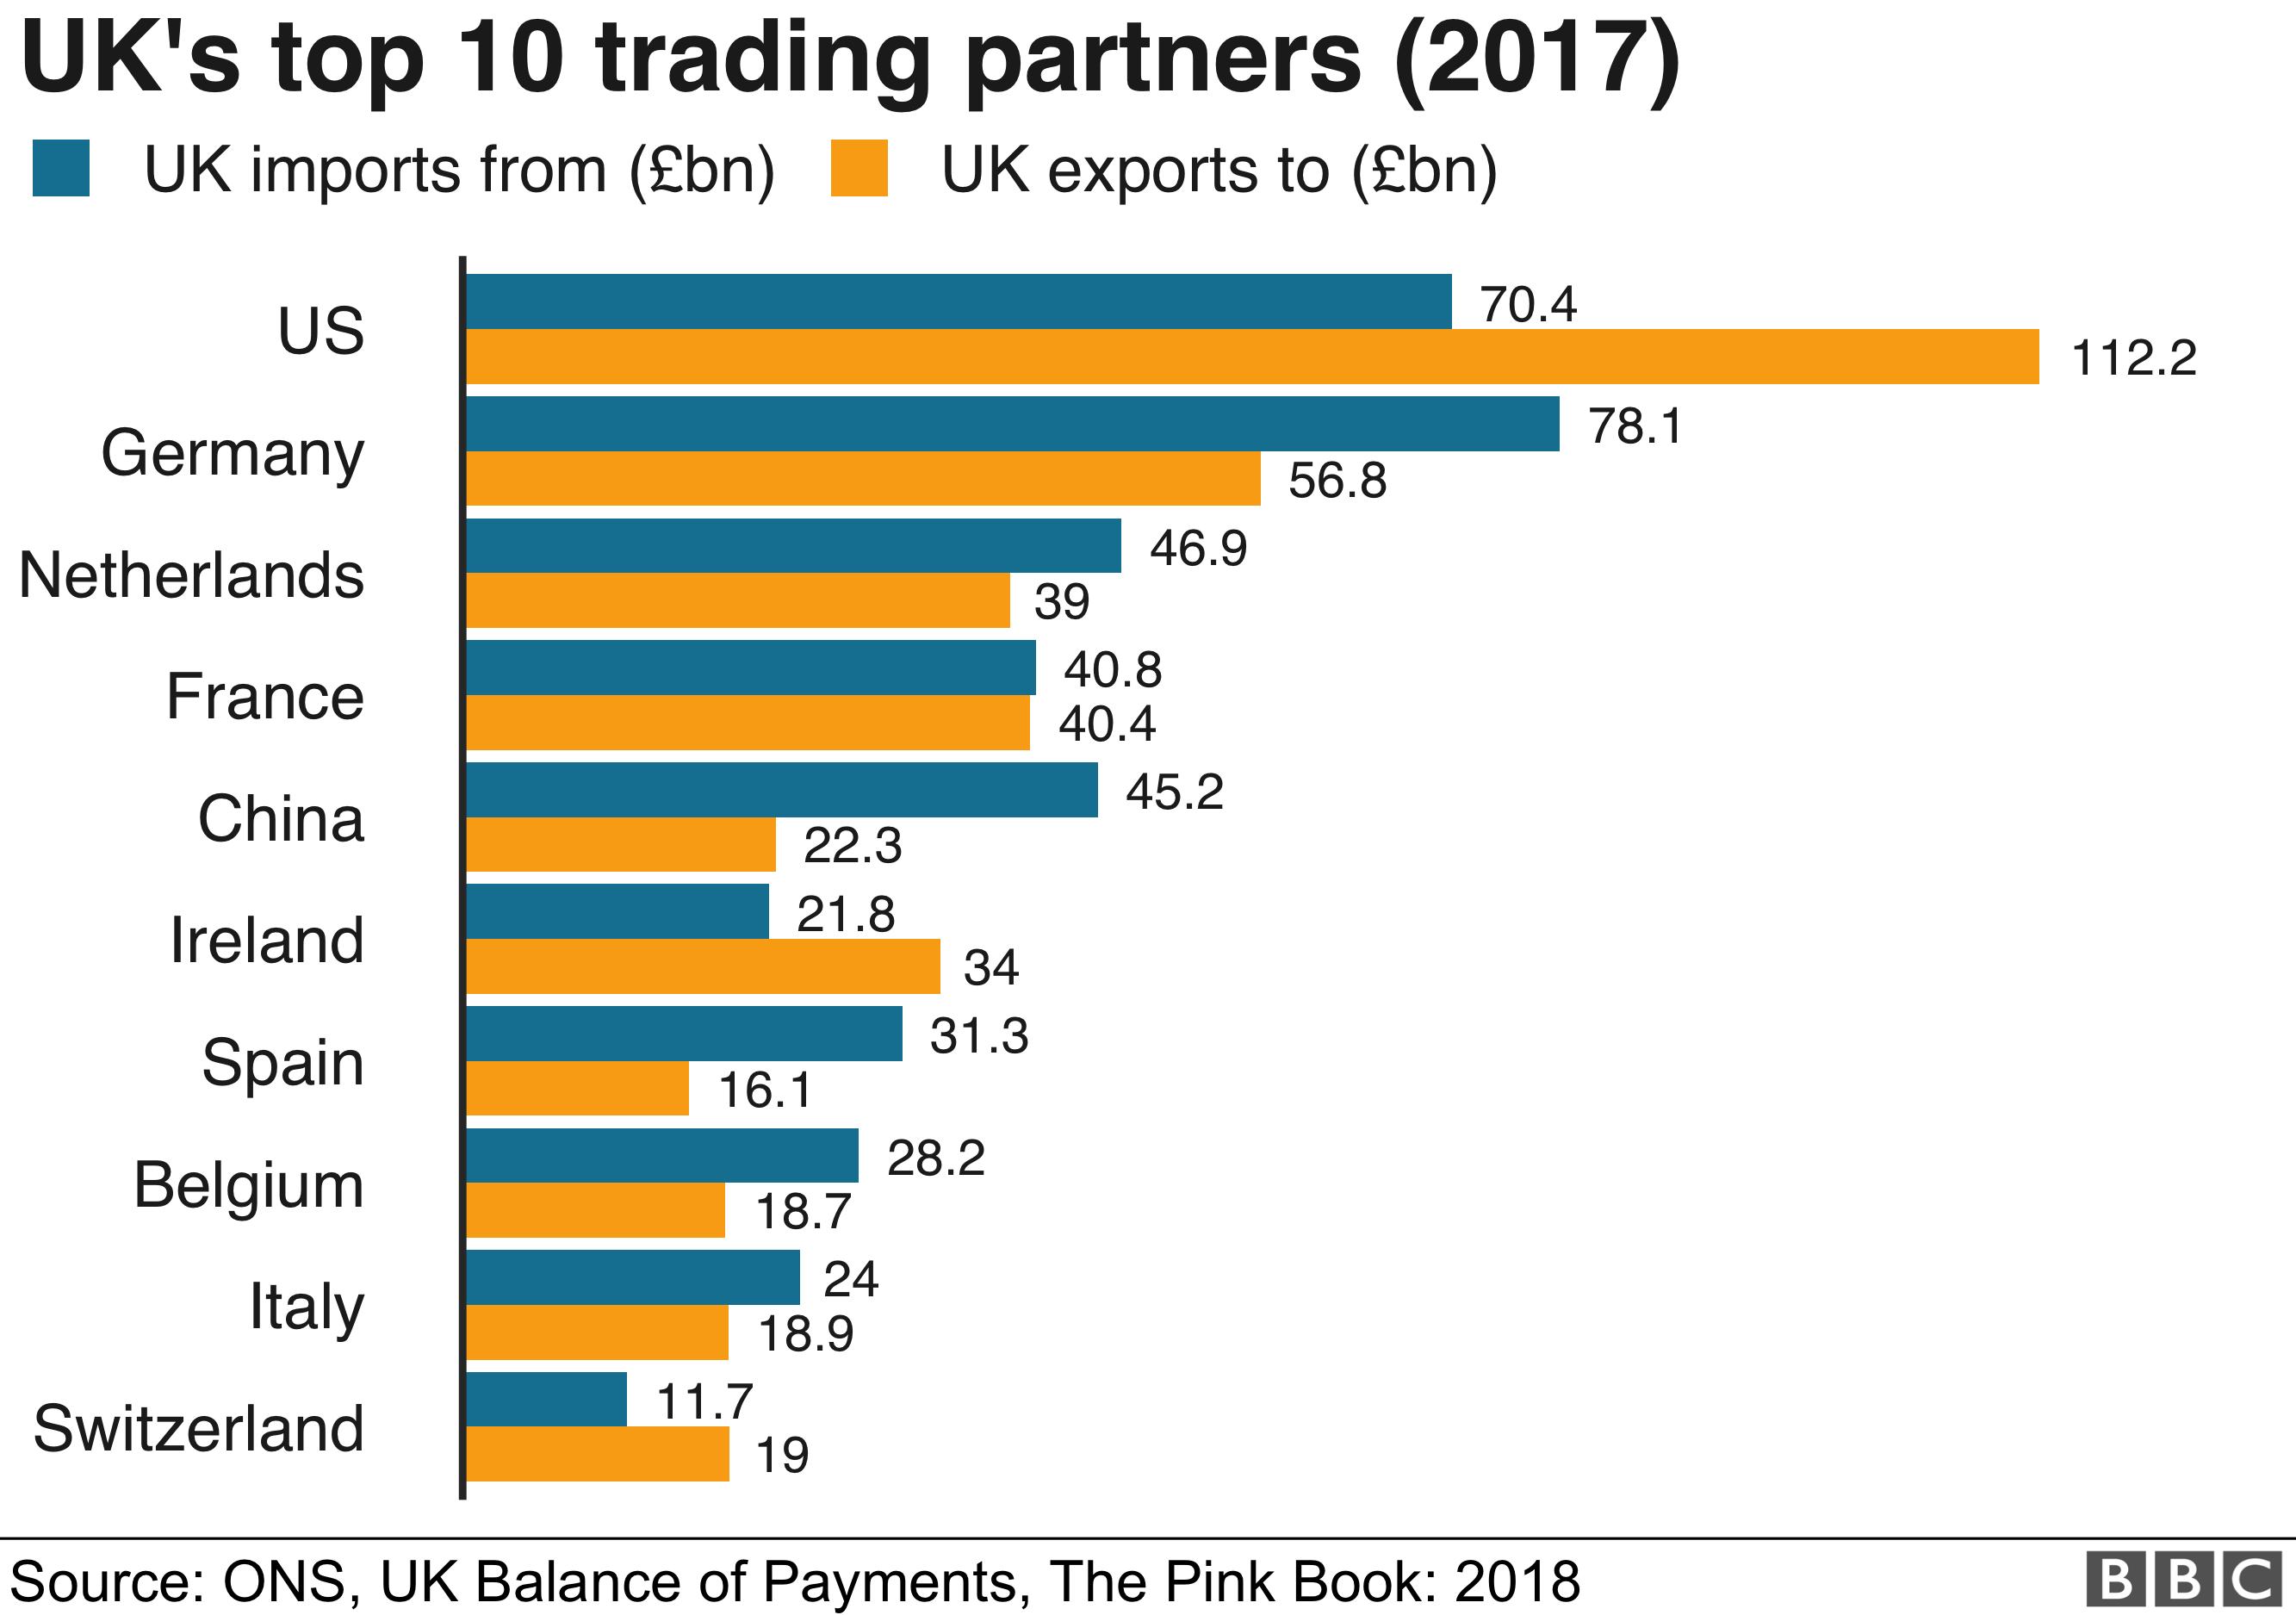 UK's main trading partners - bar chart